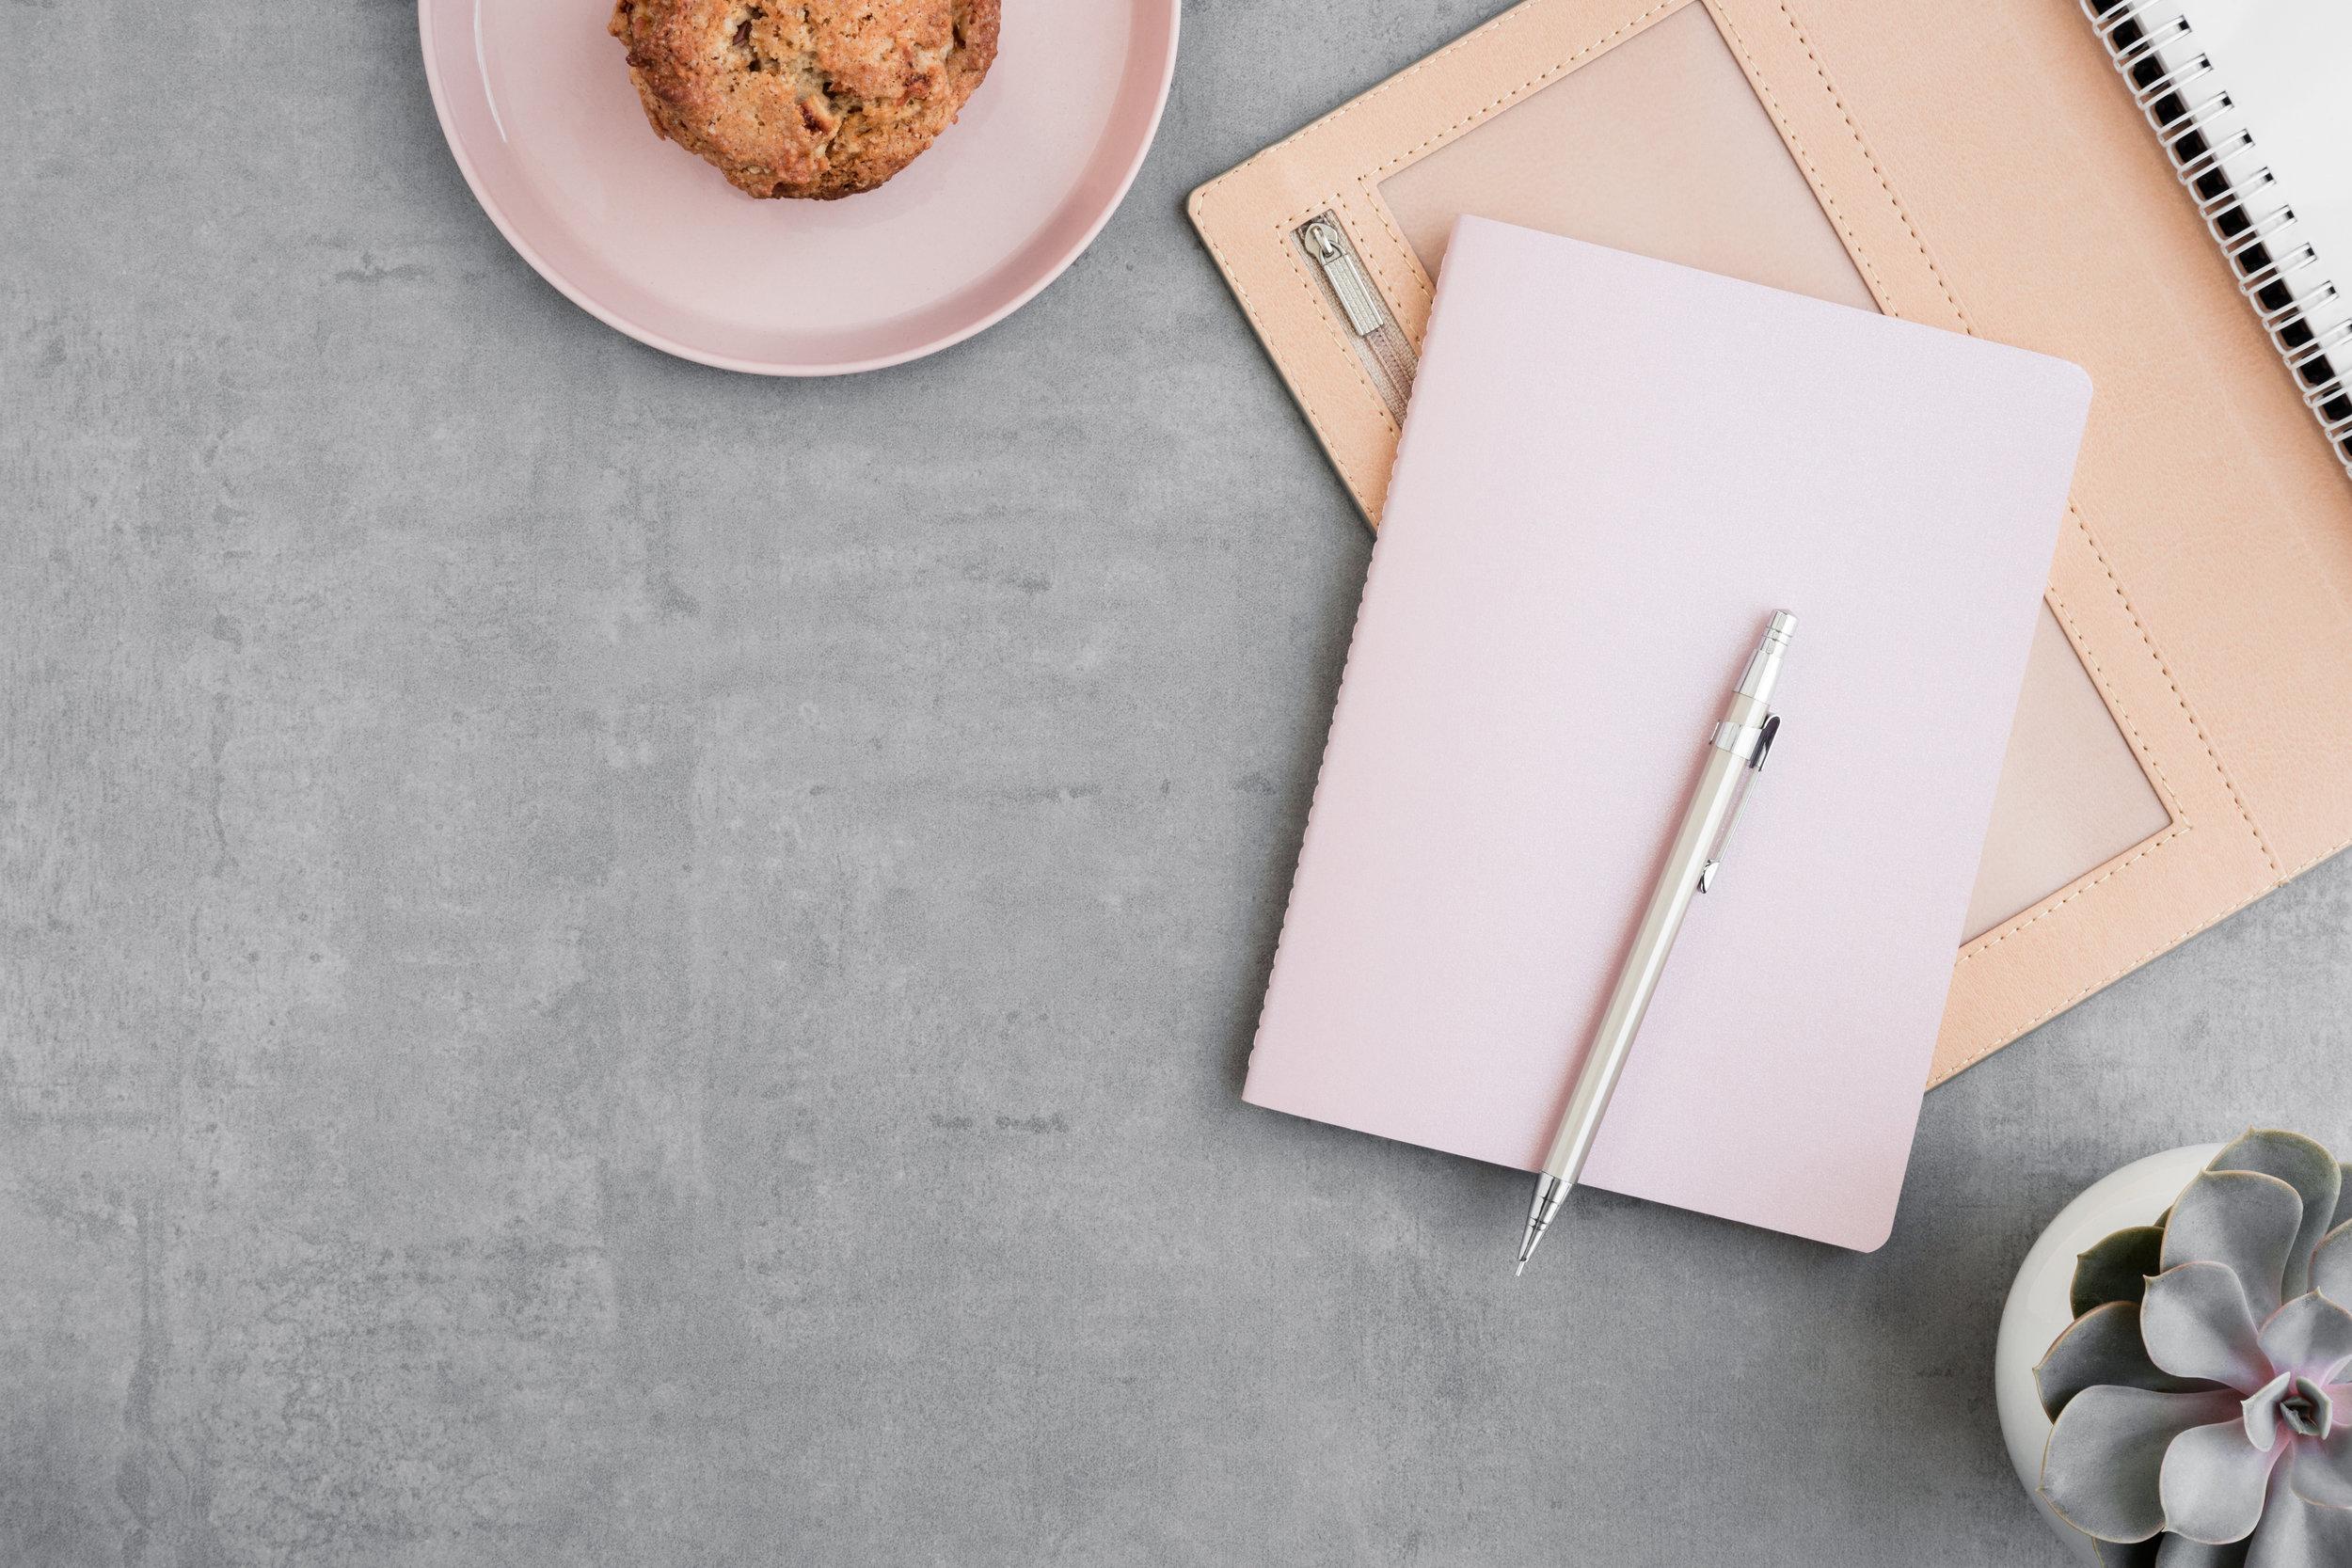 Writing tips - 5 tips to improve your editing skills. Read more at illuminatewriting.com